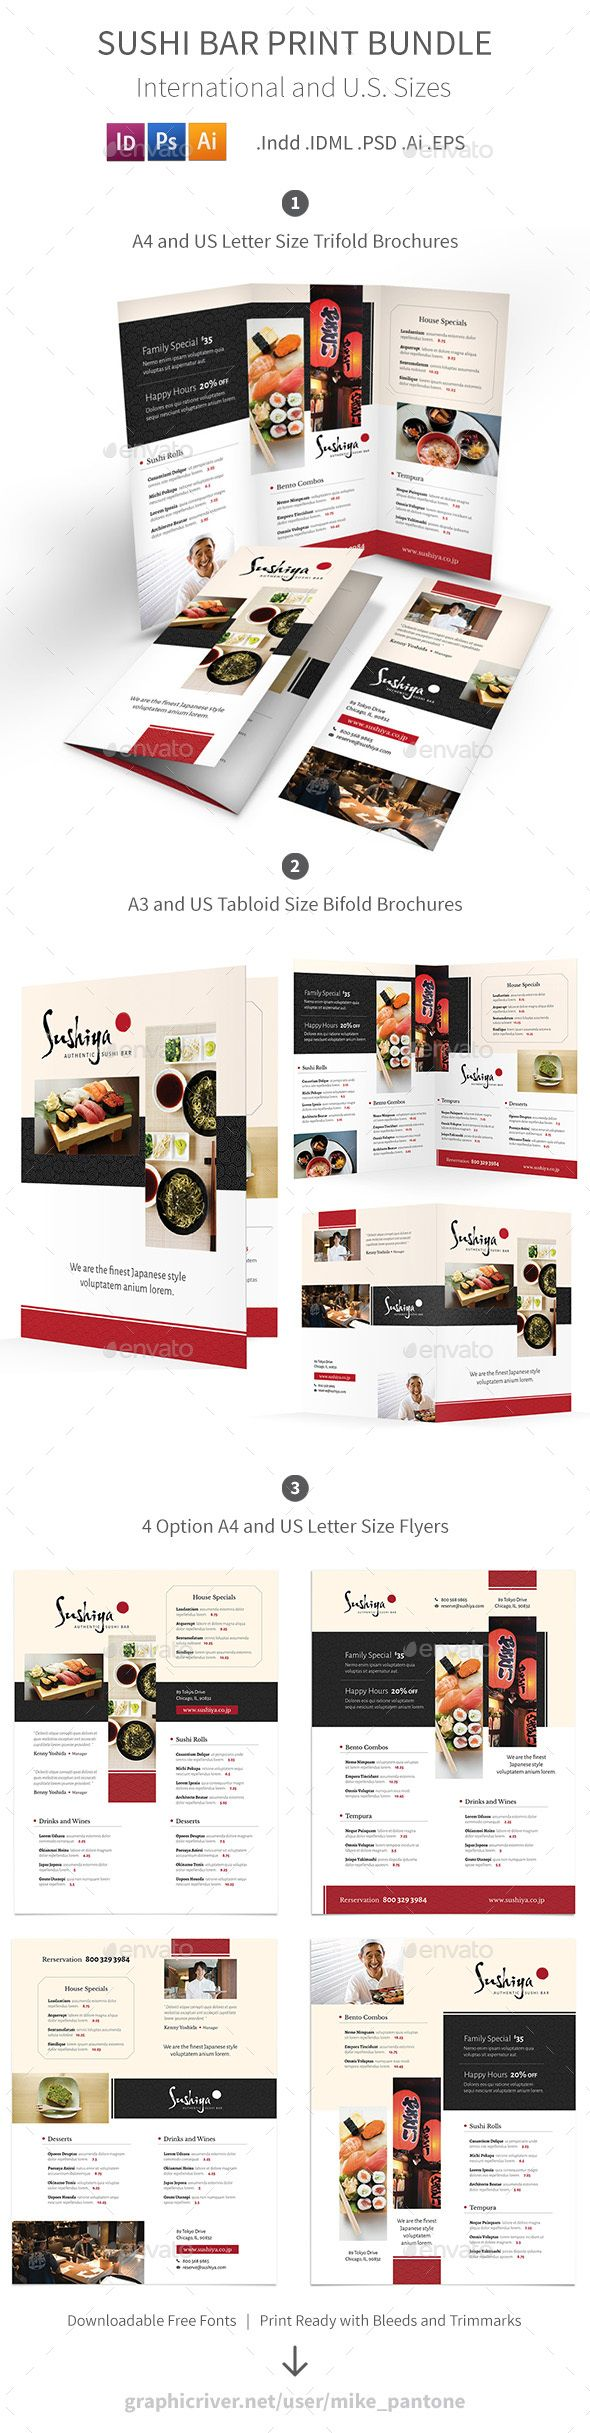 Sushi Bar Menu Print Bundle